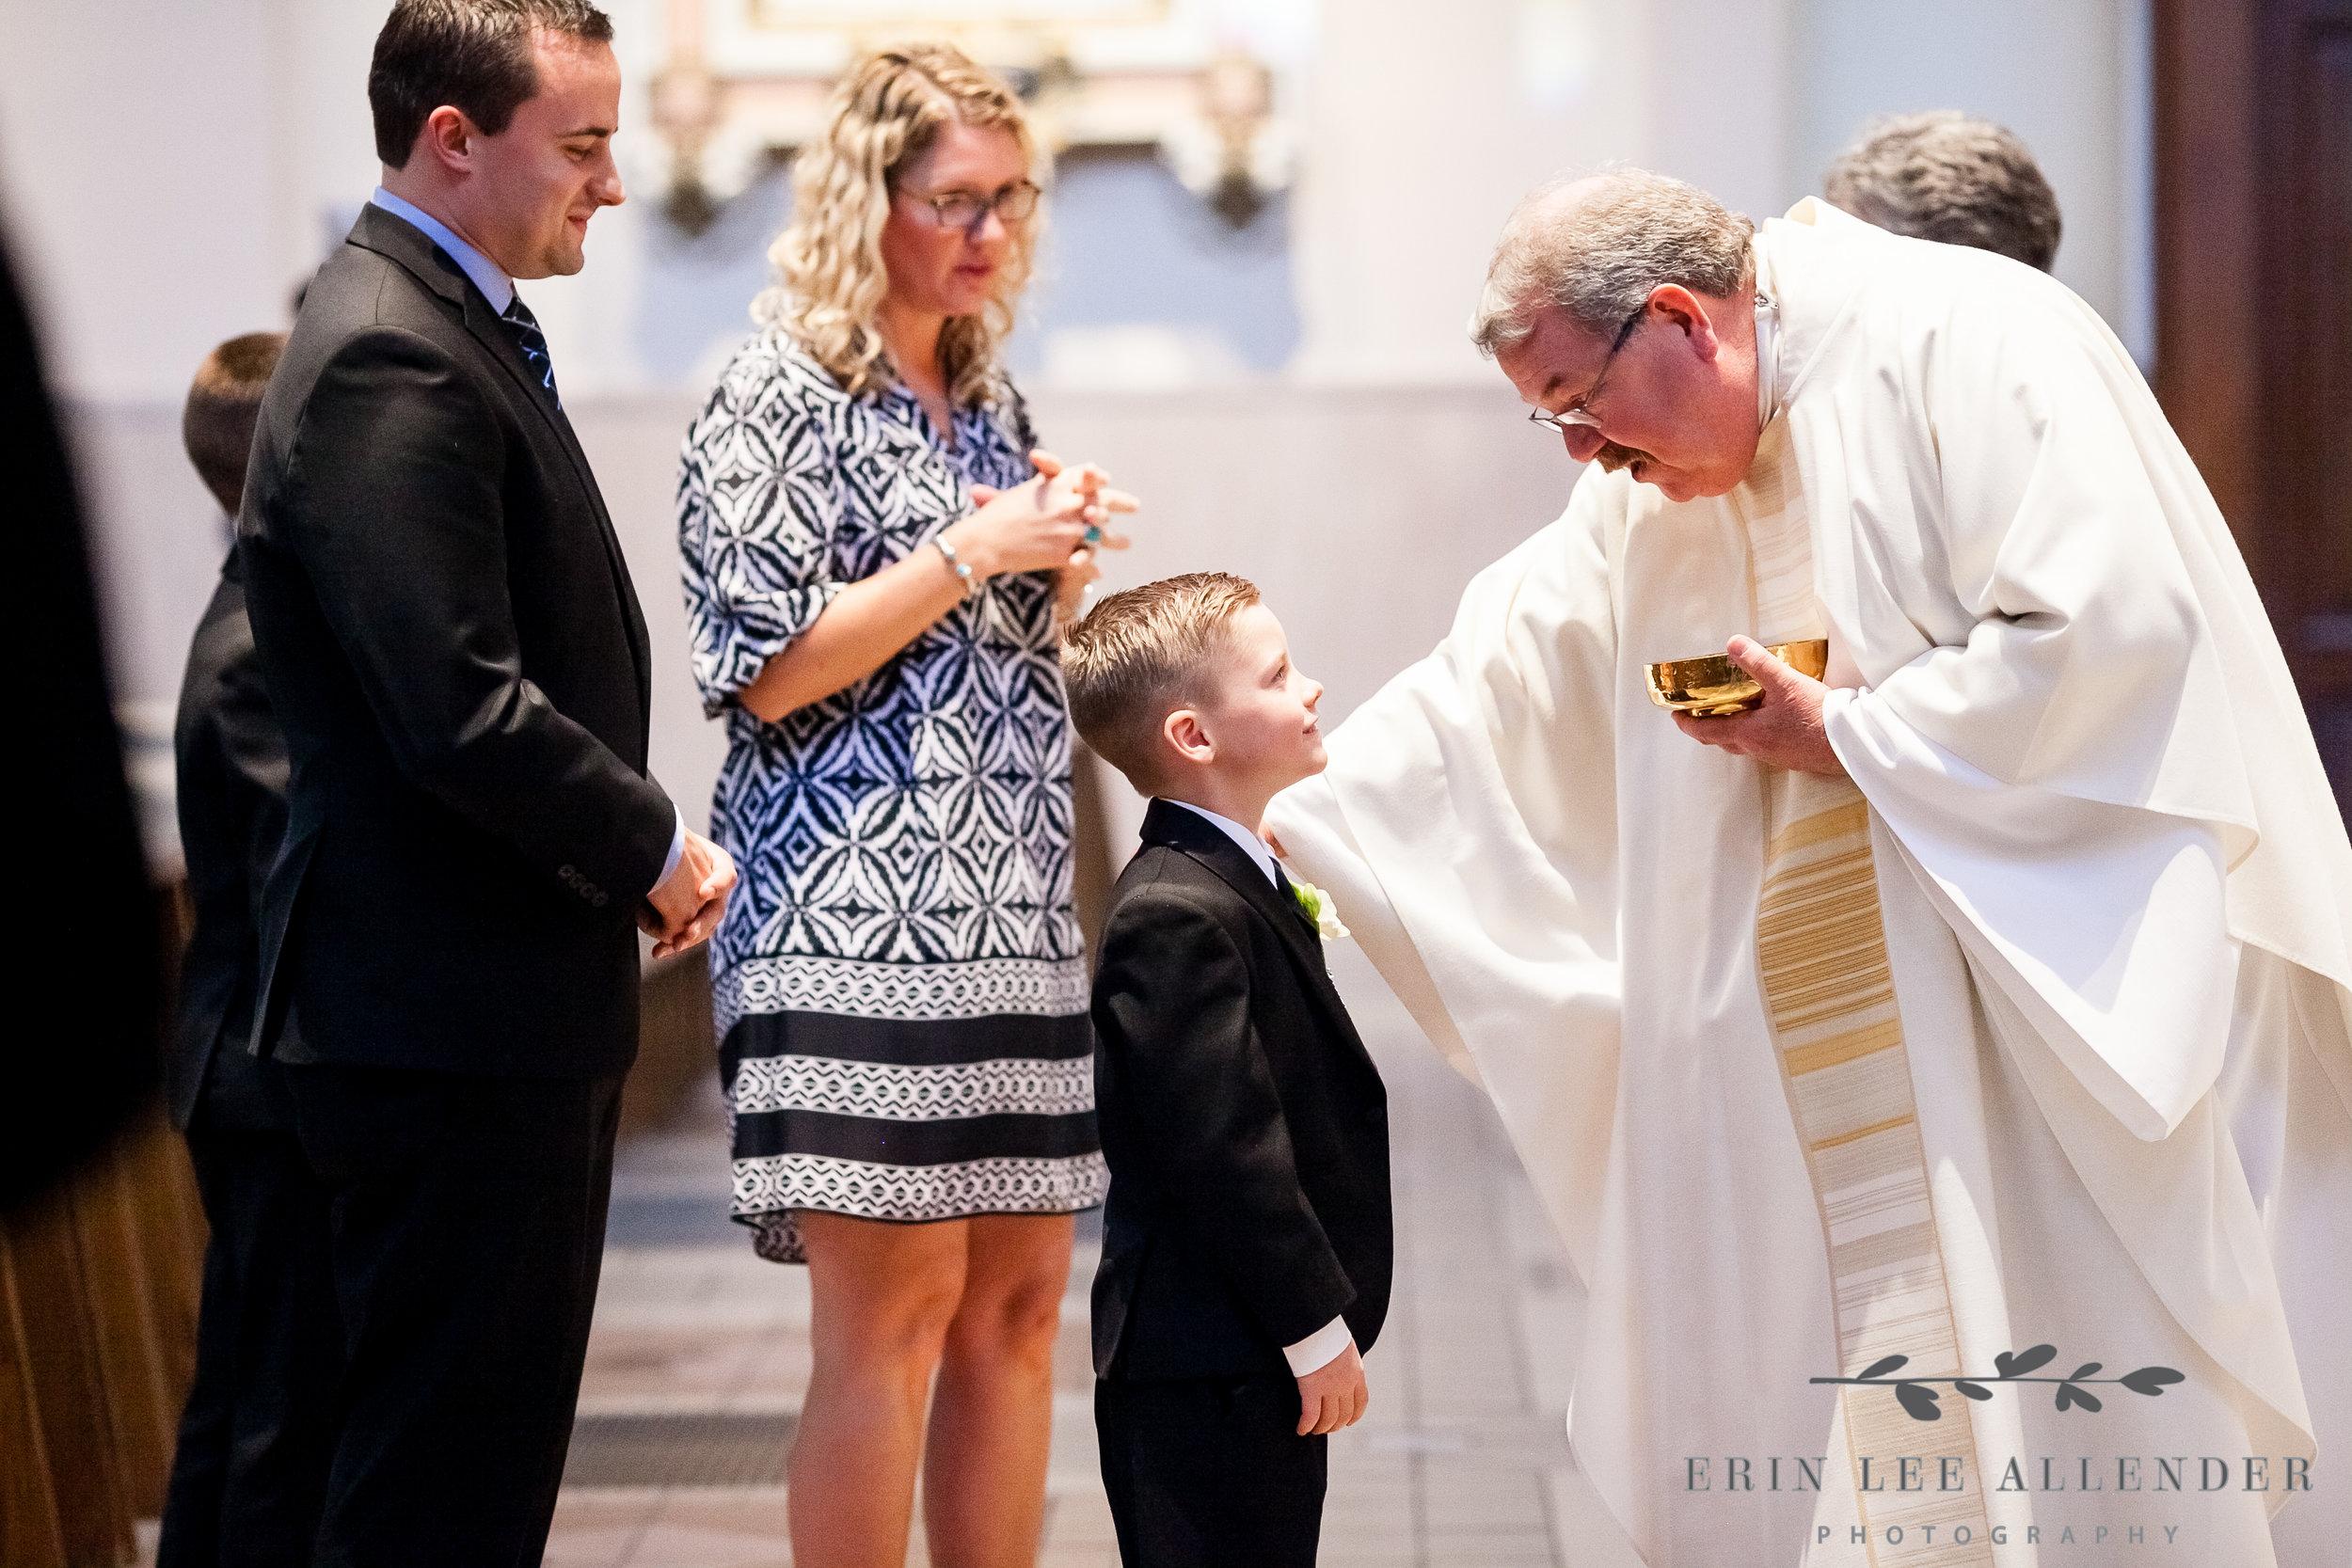 Priest_Blesses Child